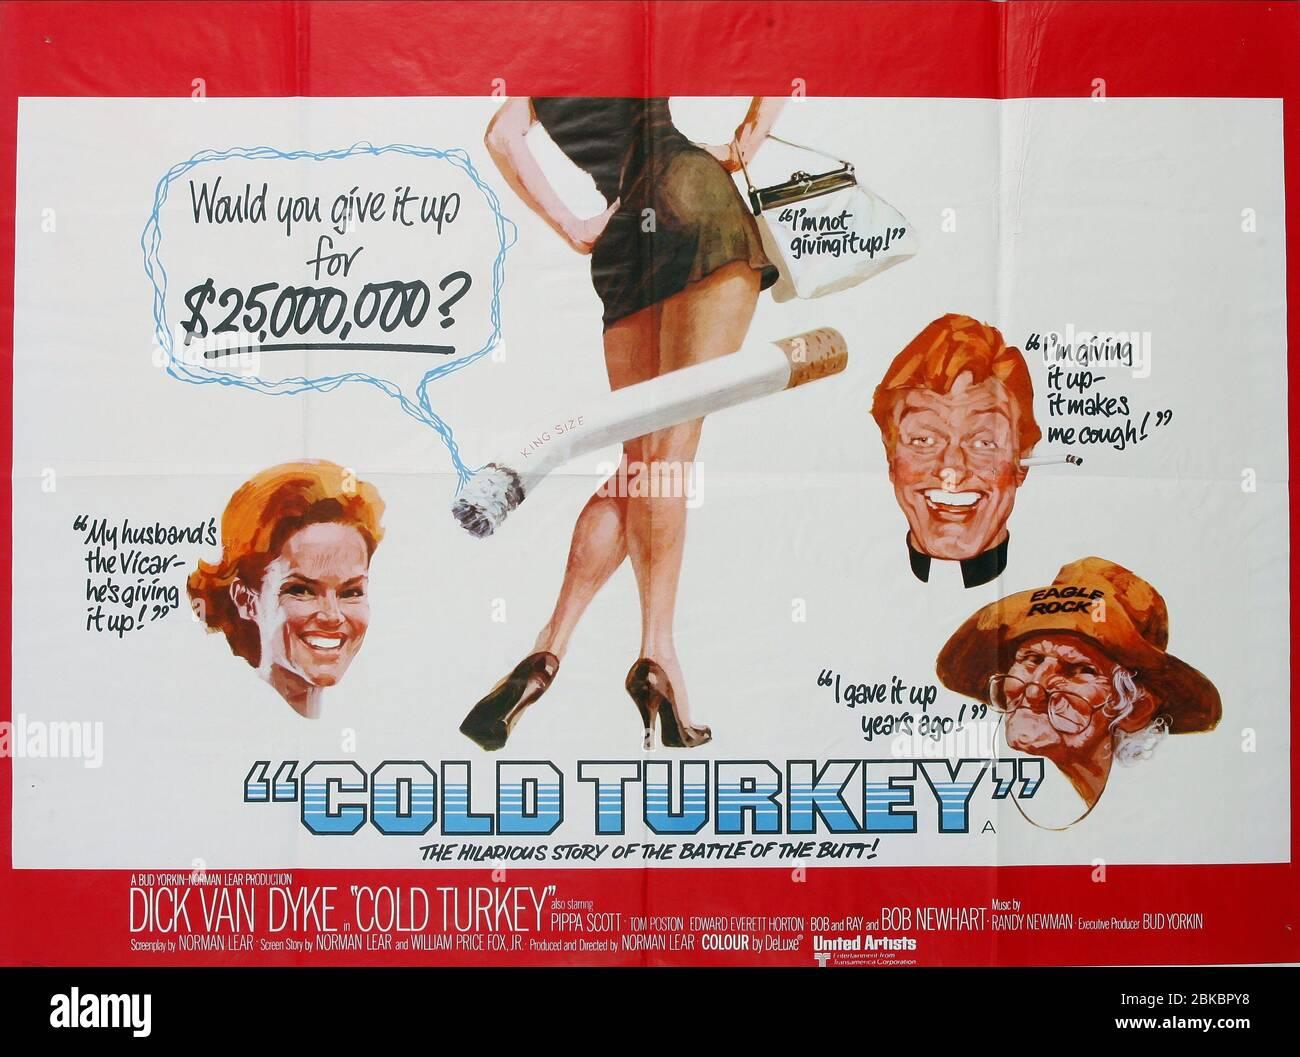 folded-film-poster-cold-turkey-1971-2BKBPY8.jpg